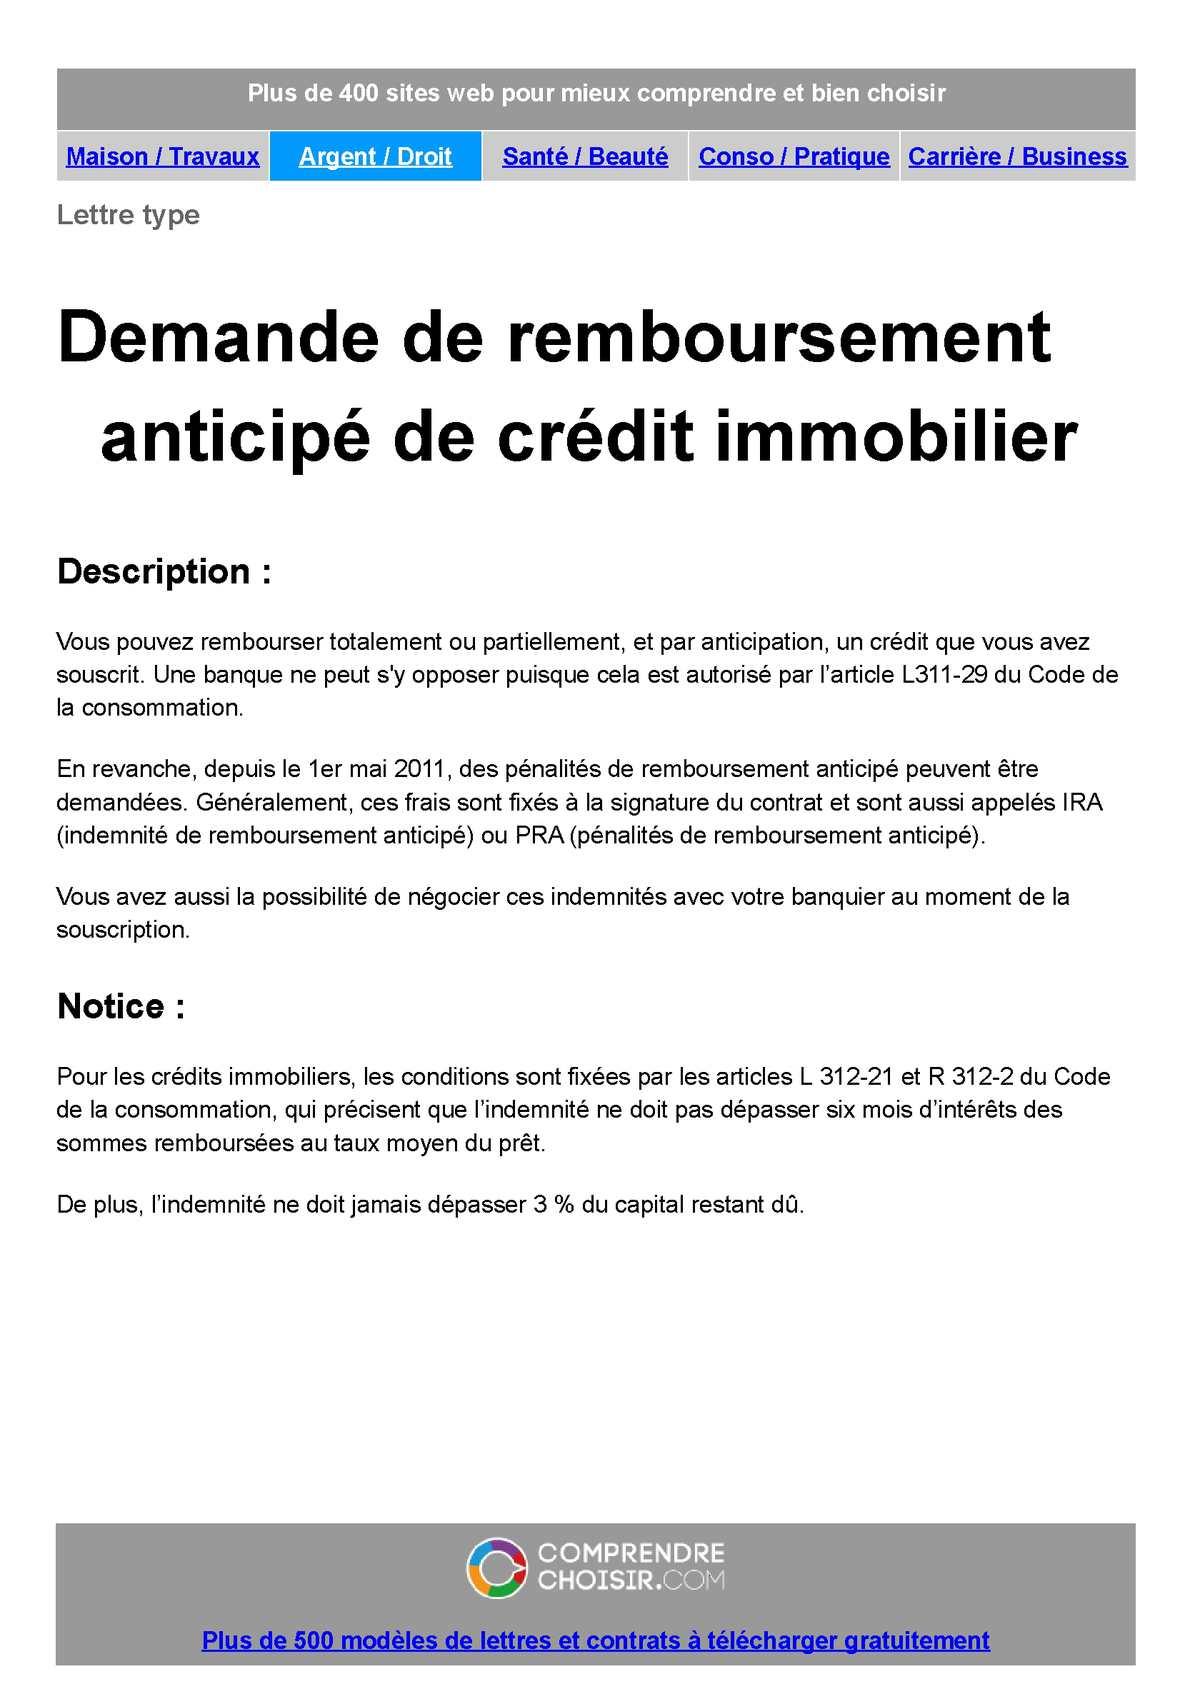 Calameo Credit Immobilier Demande De Remboursement Anticipe